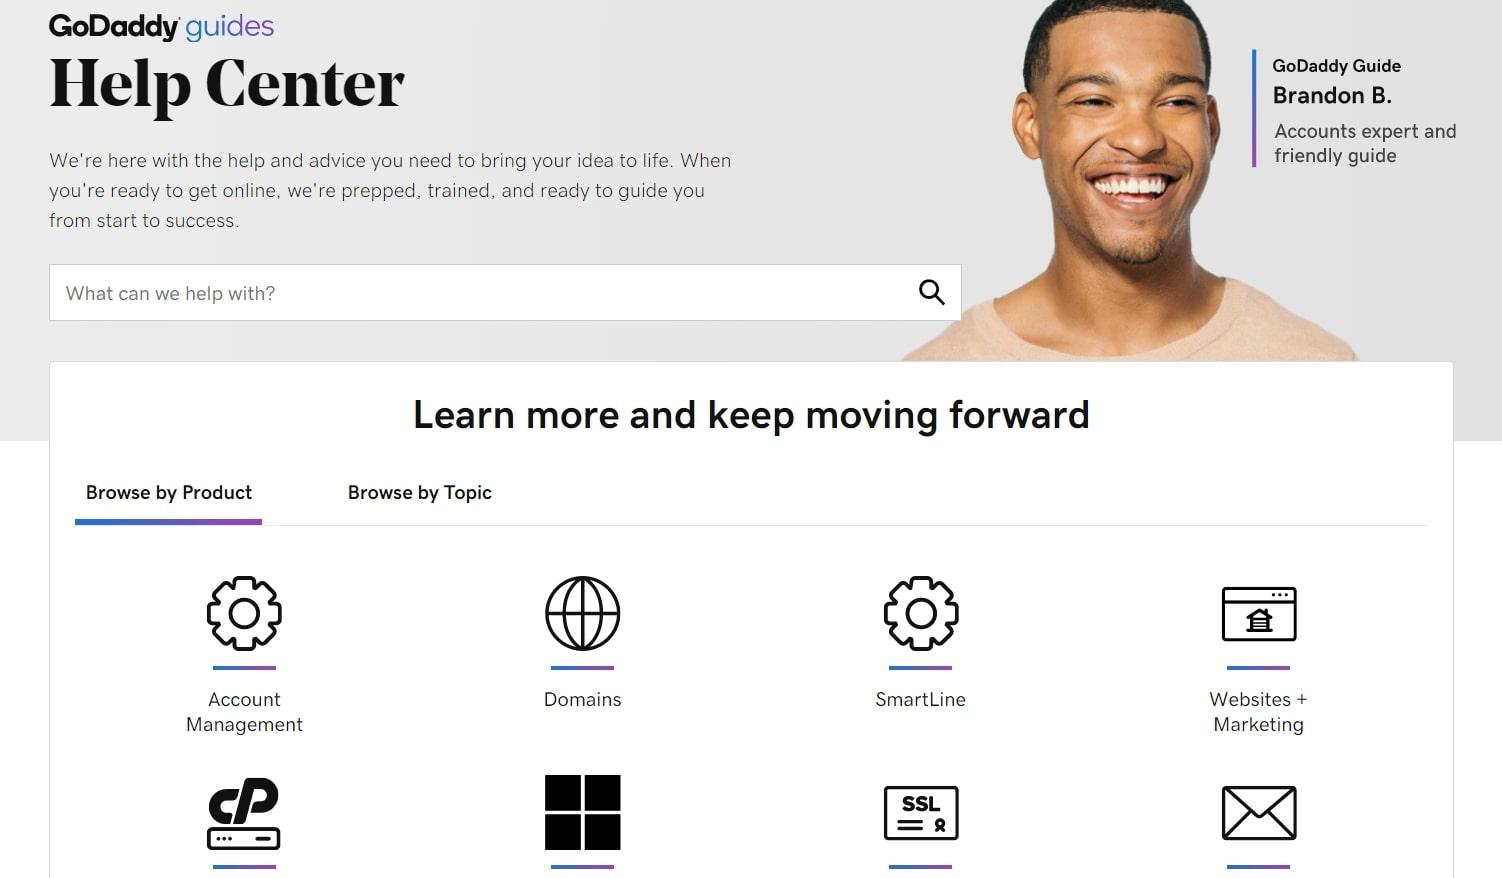 GoDaddy's help center homepage